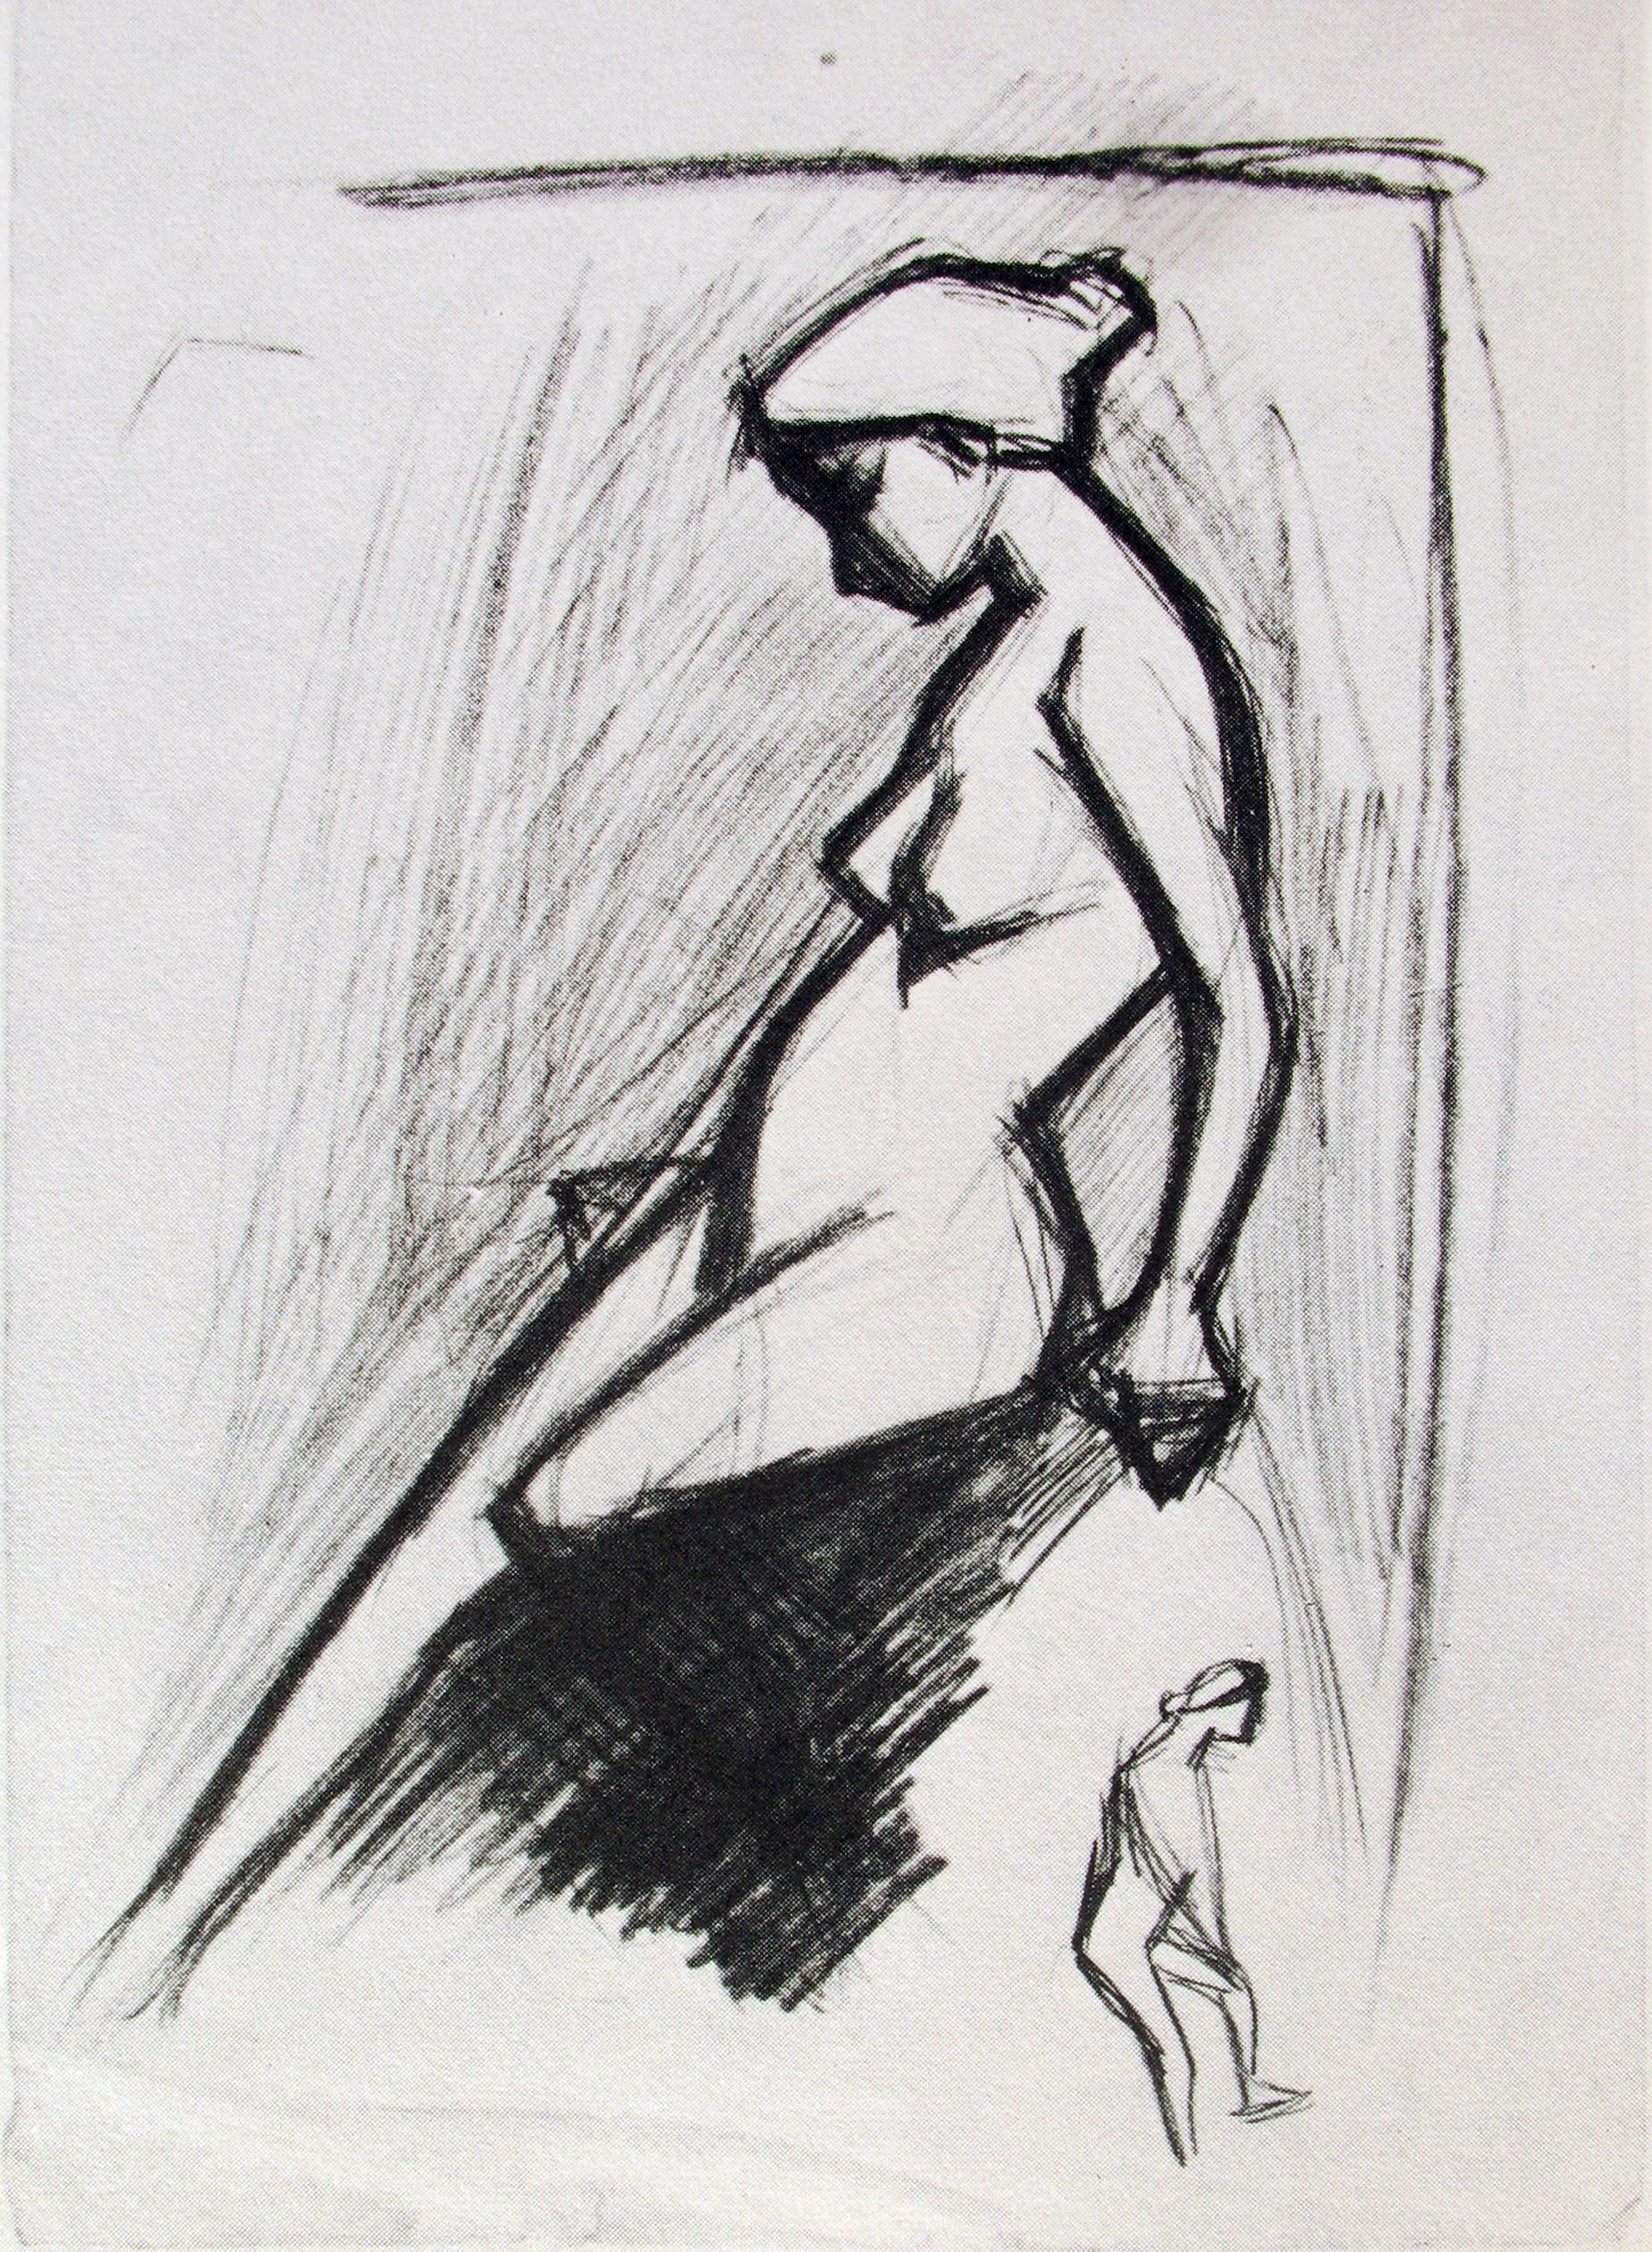 Pablo Picasso - croquis - nude 4